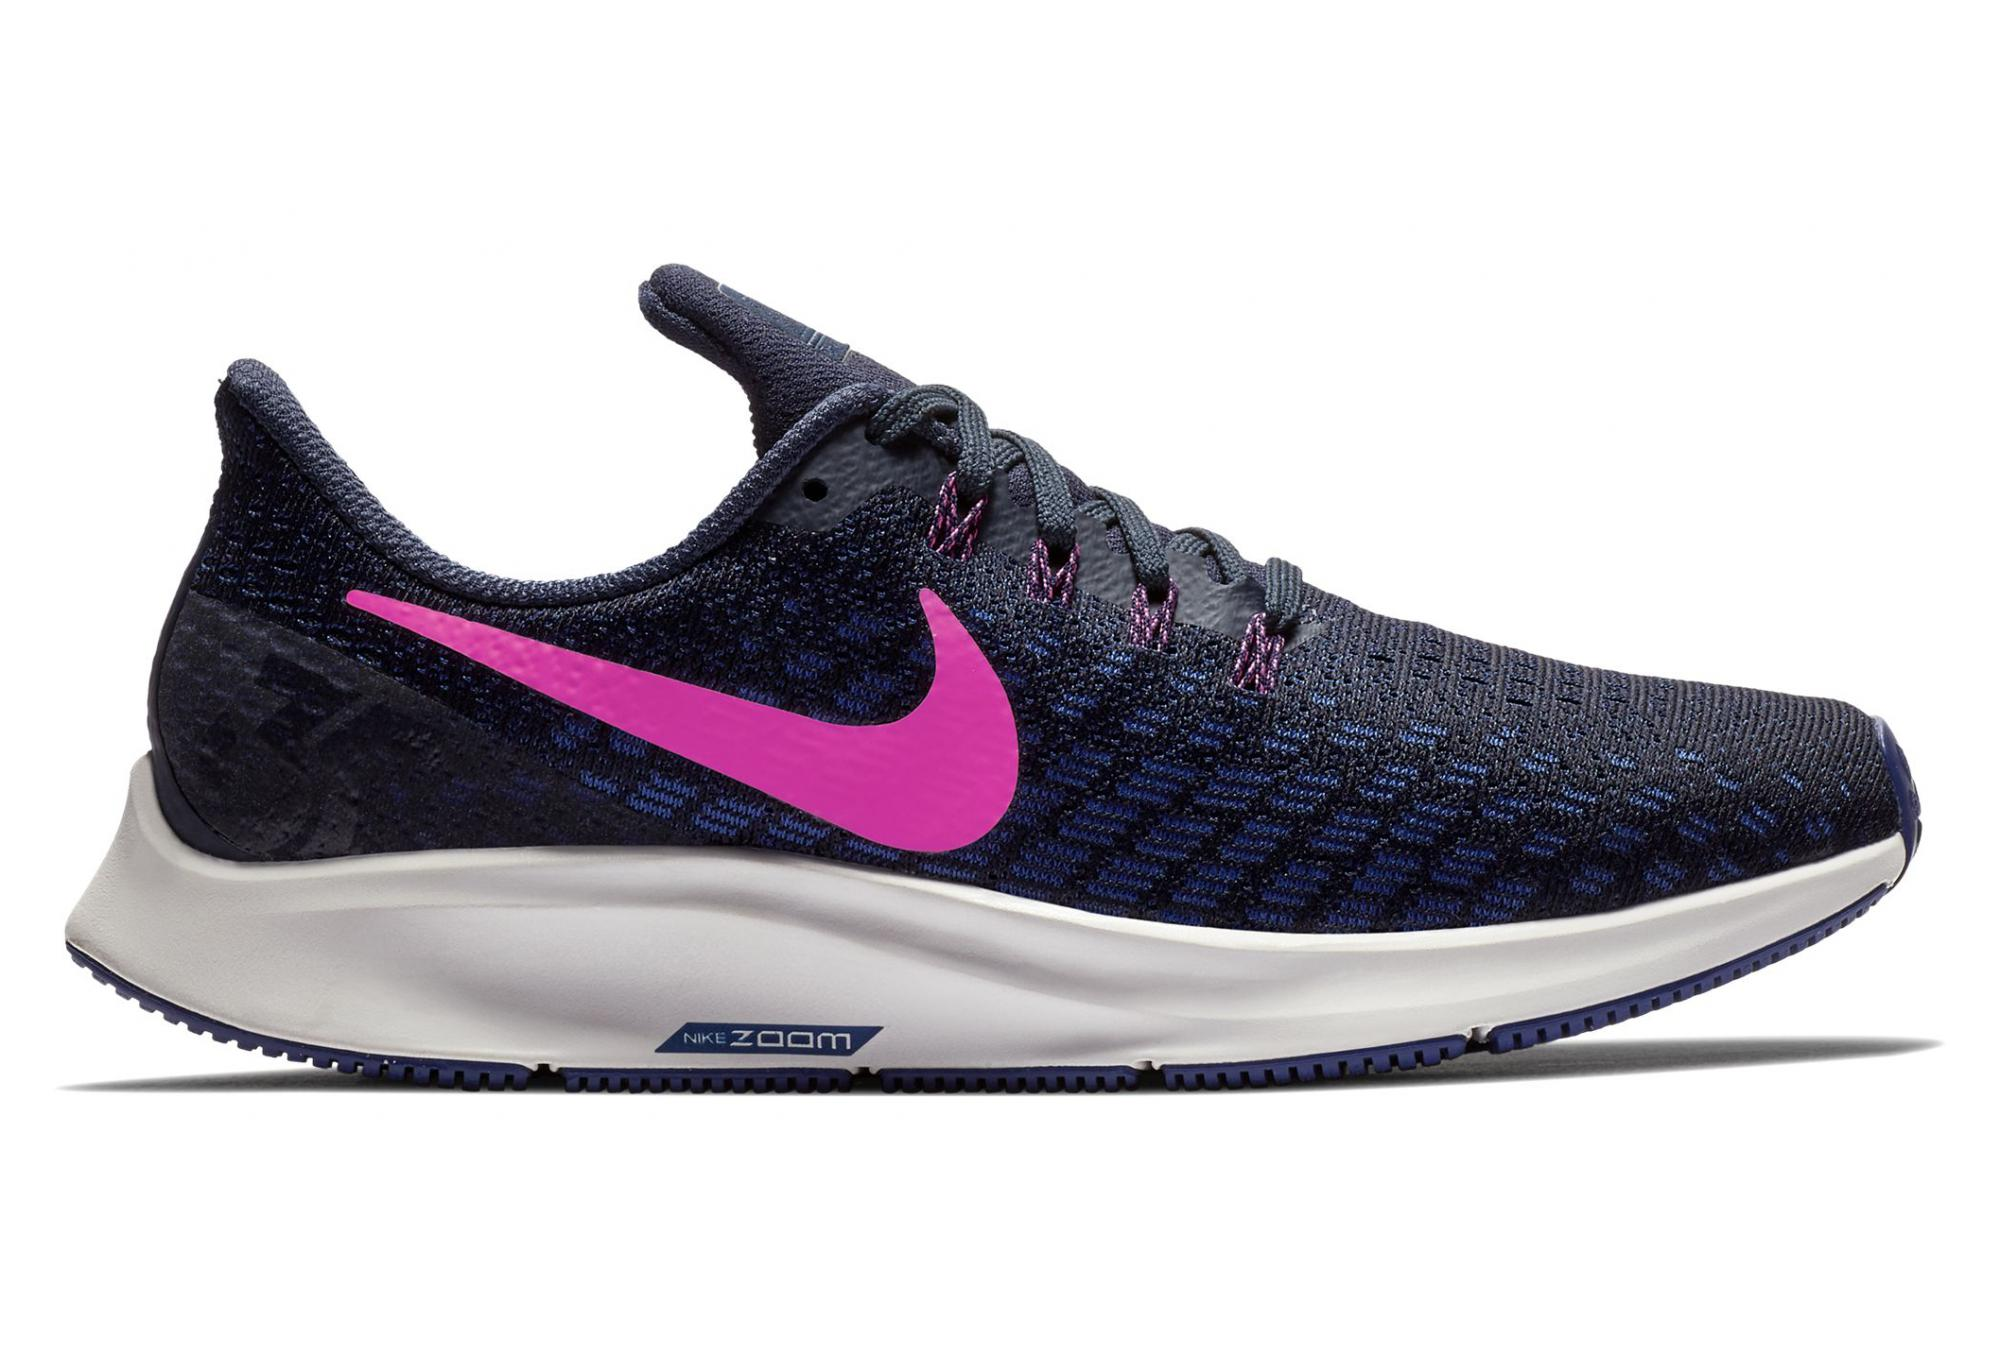 sports shoes 2146e 6d6c1 Chaussures de Running Femme Nike Air Zoom Pegasus 35 Bleu   Rose